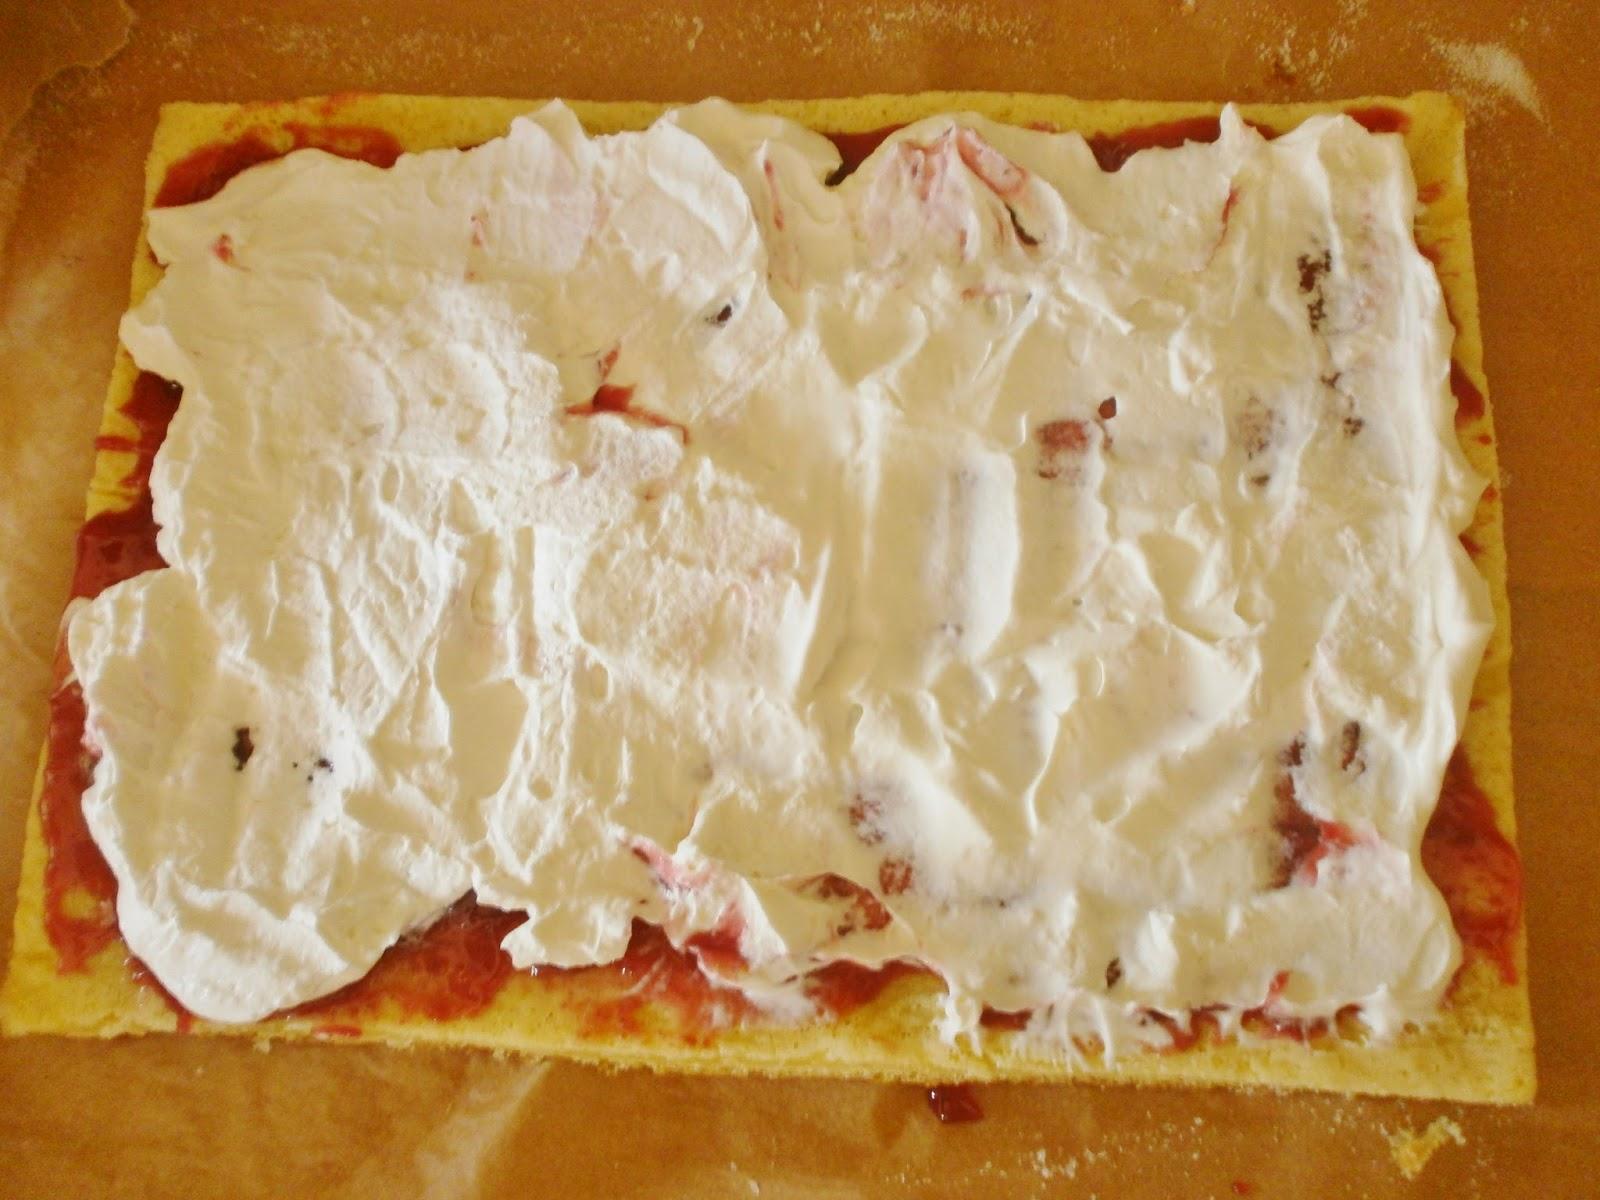 Jam and cream in homemade swiss roll